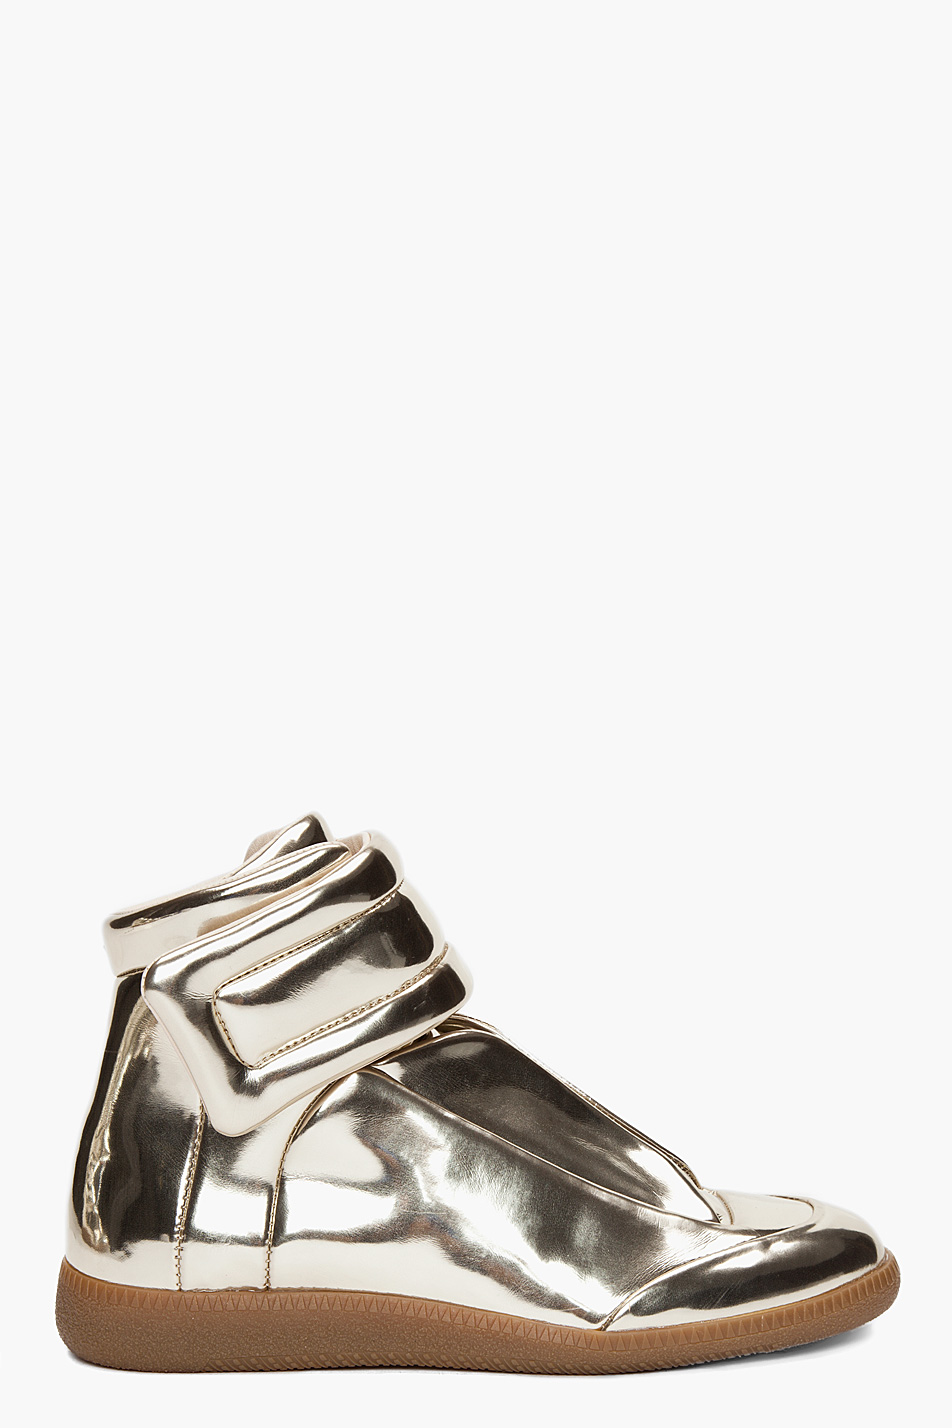 Maison martin margiela metallic sneakers for Maison martin margiela